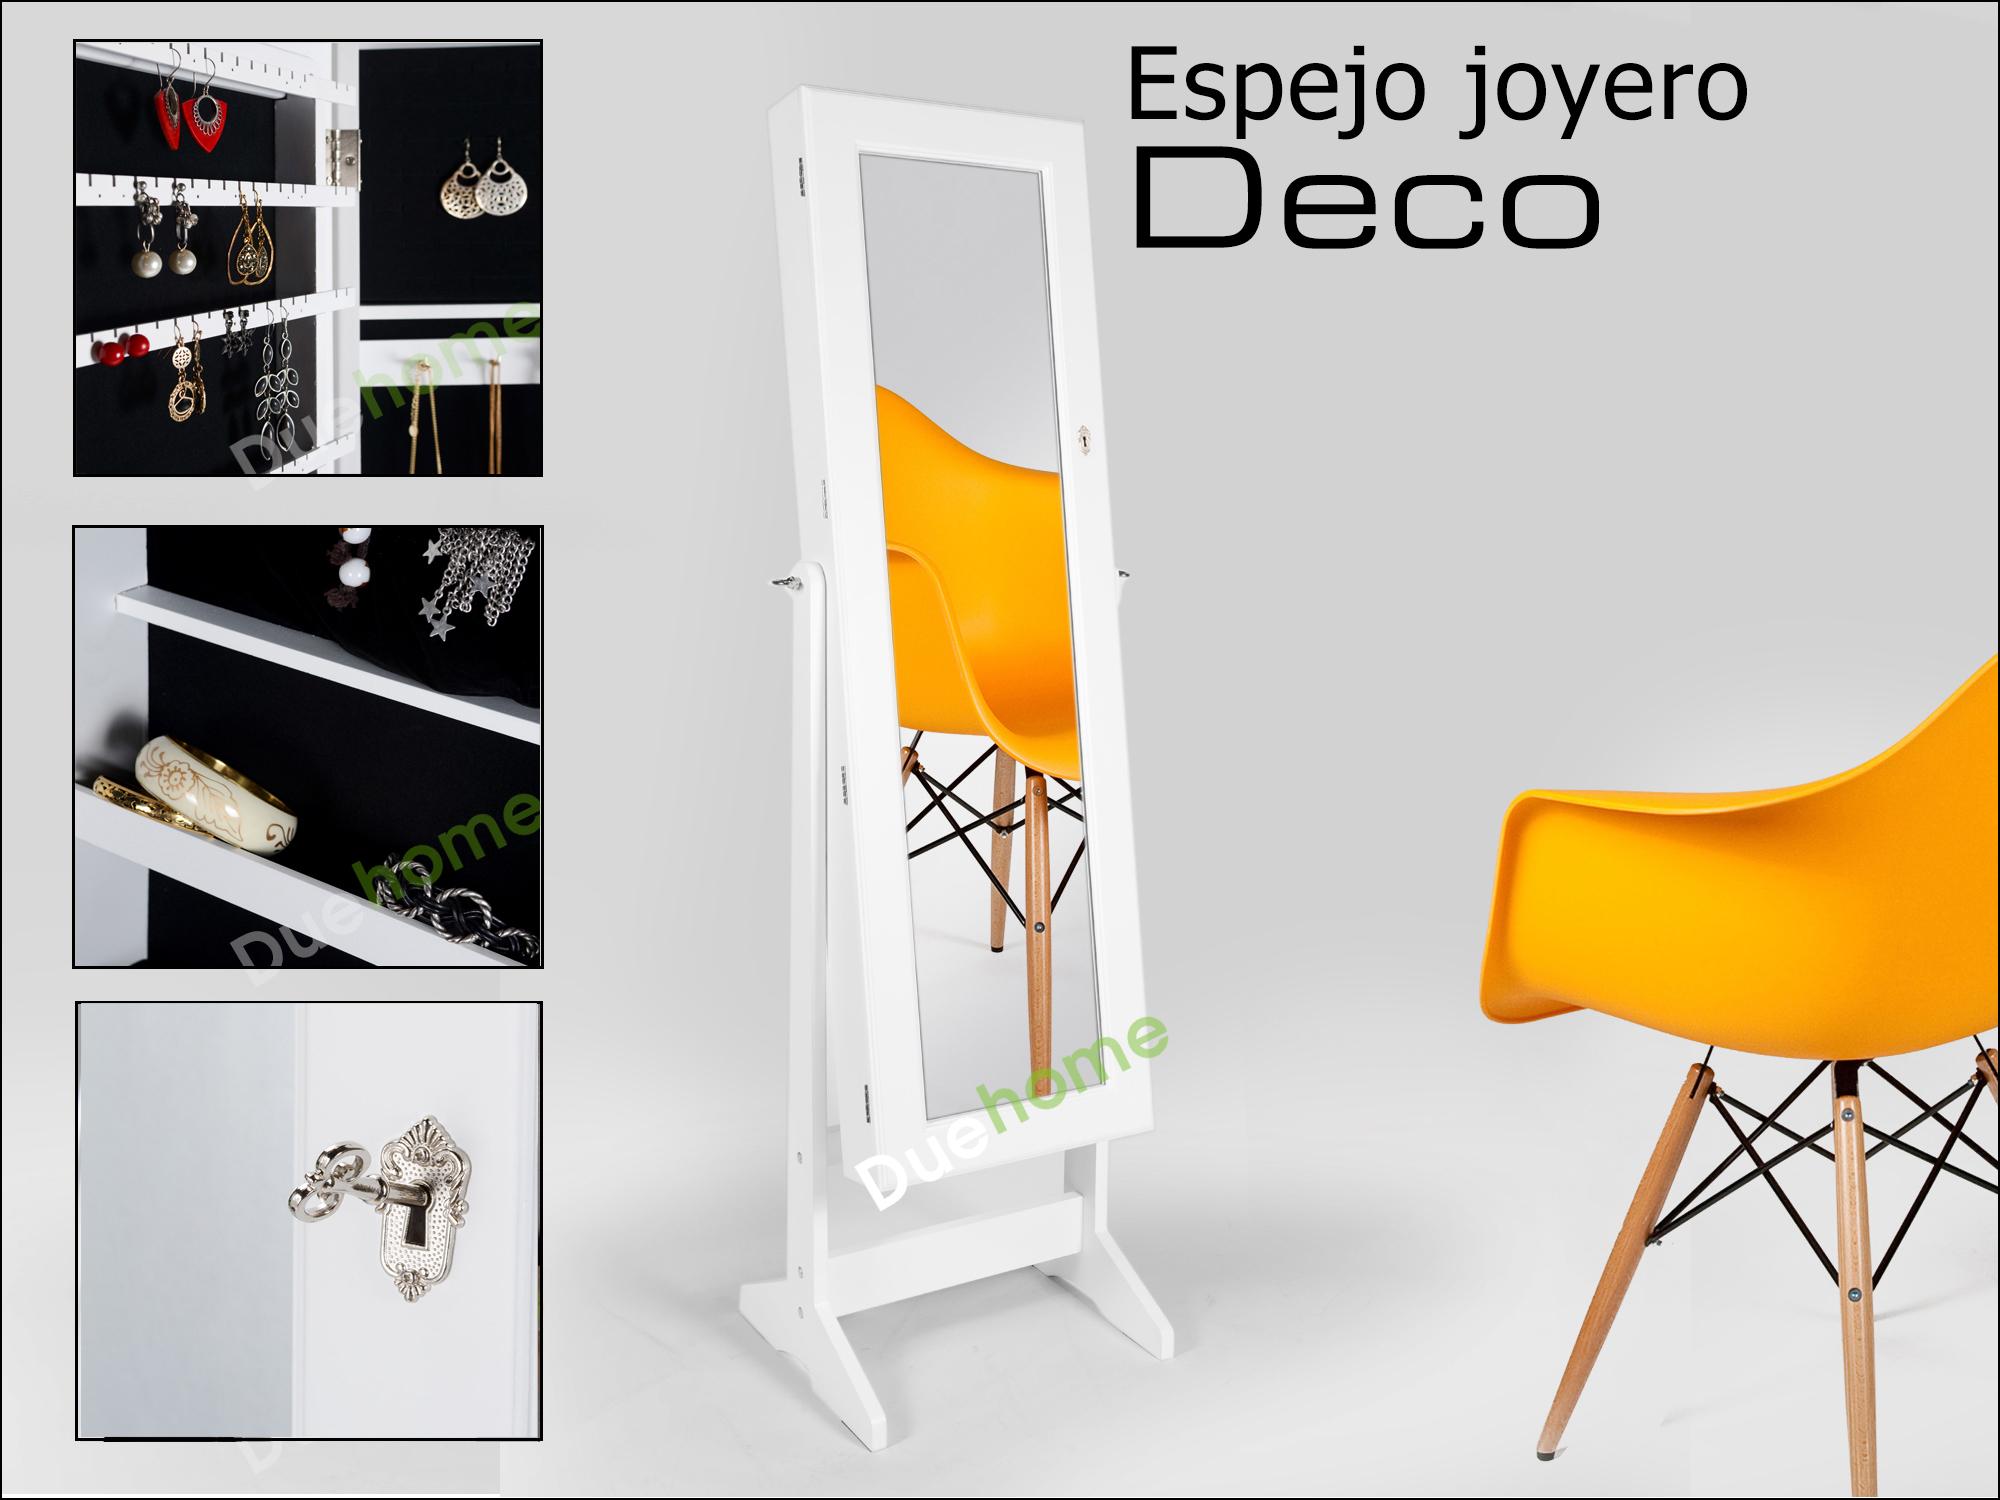 Espejo joyero sharemedoc for Espejo joyero xxl